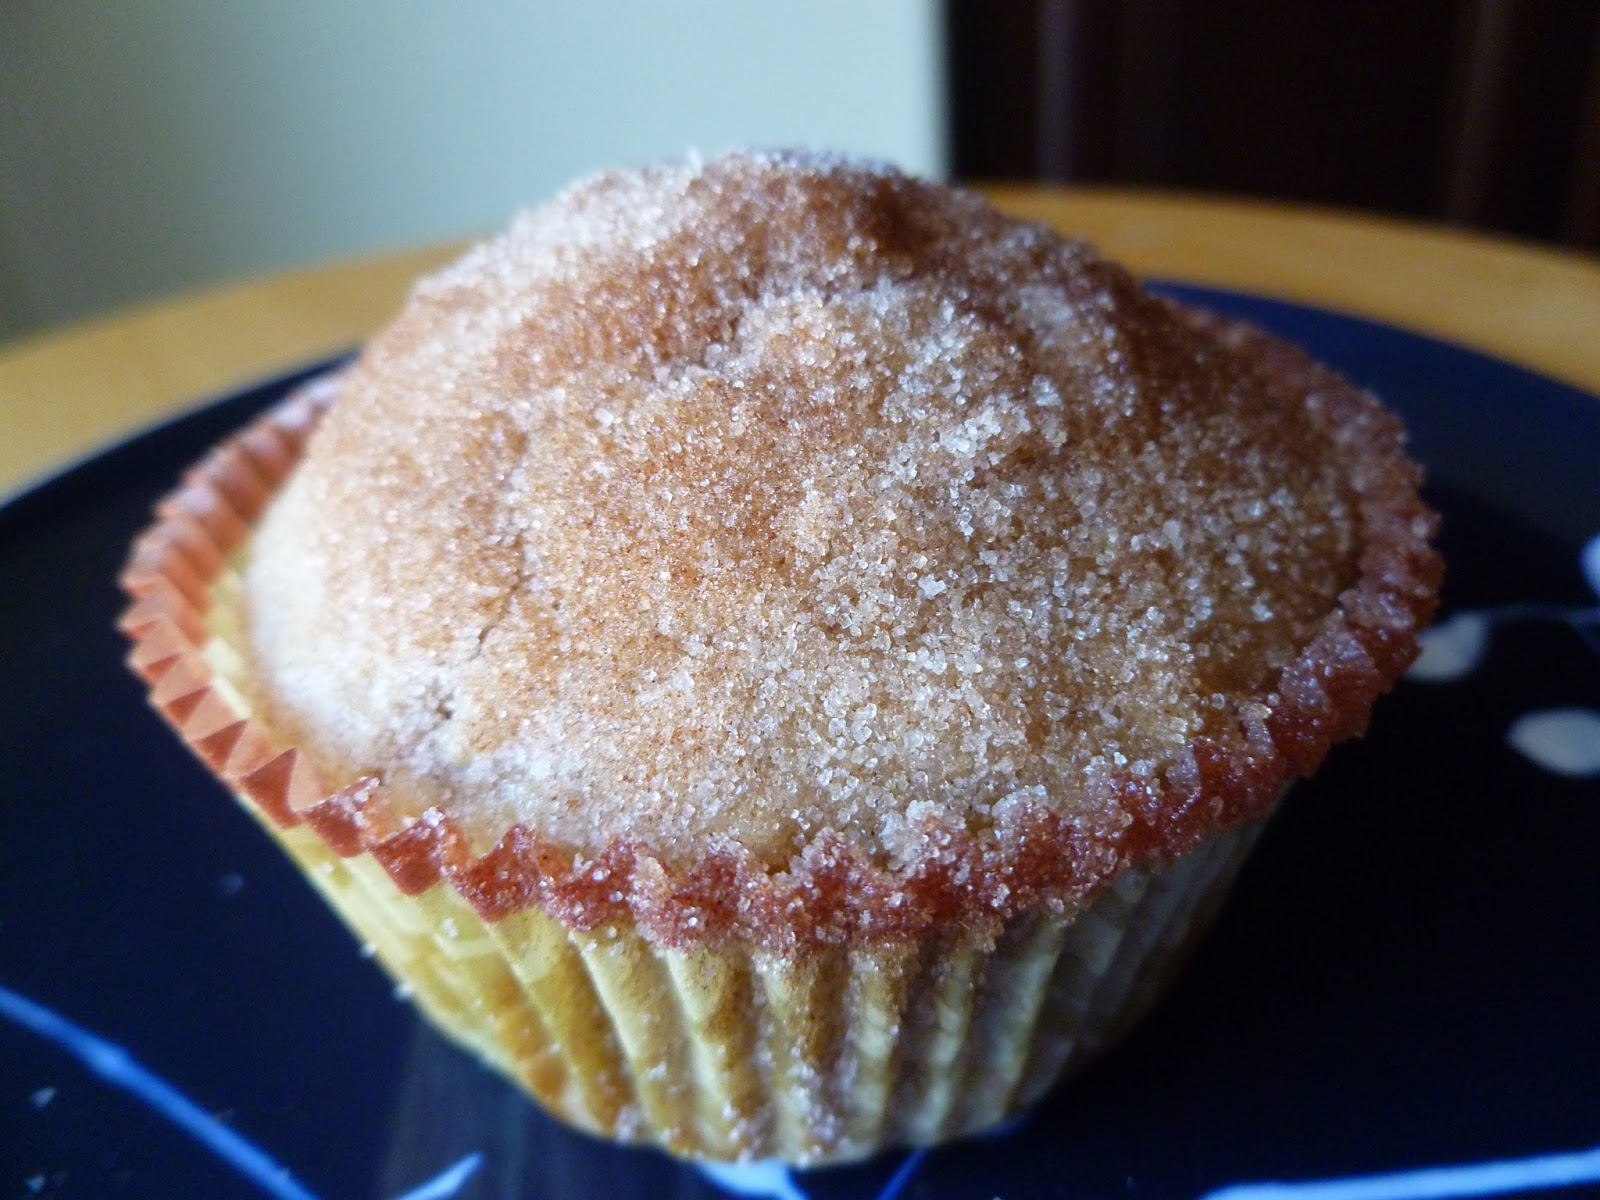 The Pastry Chef's Baking: Sprinkles Cinnamon Sugar Cupcakes